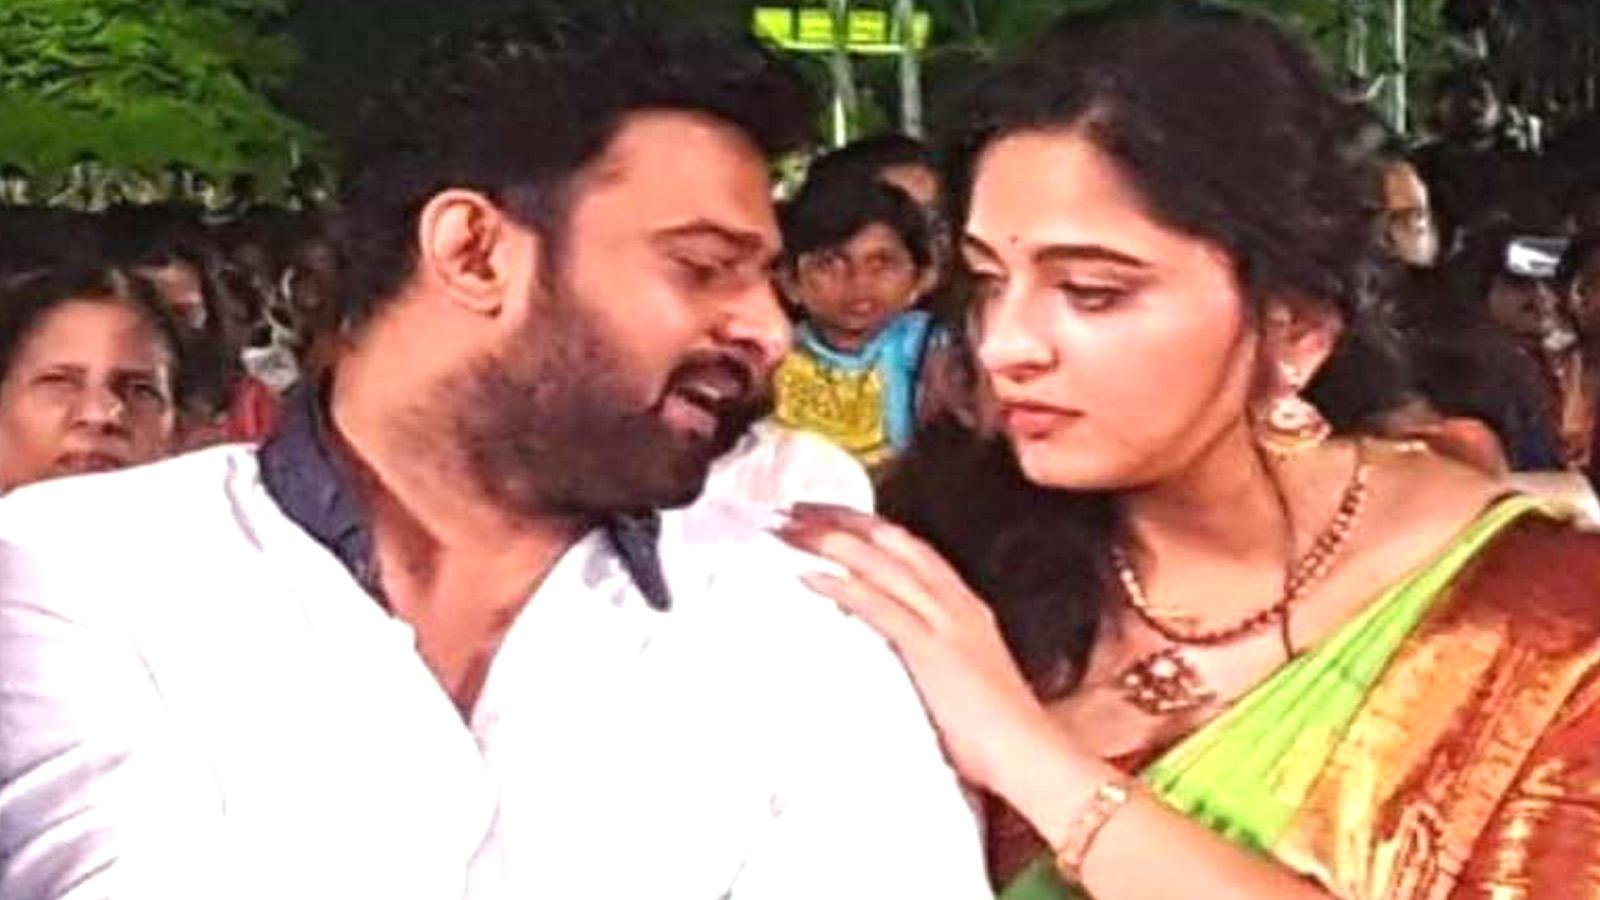 Prabhas opens up on dating rumours with 'Baahubali' co-star Anushka Shetty